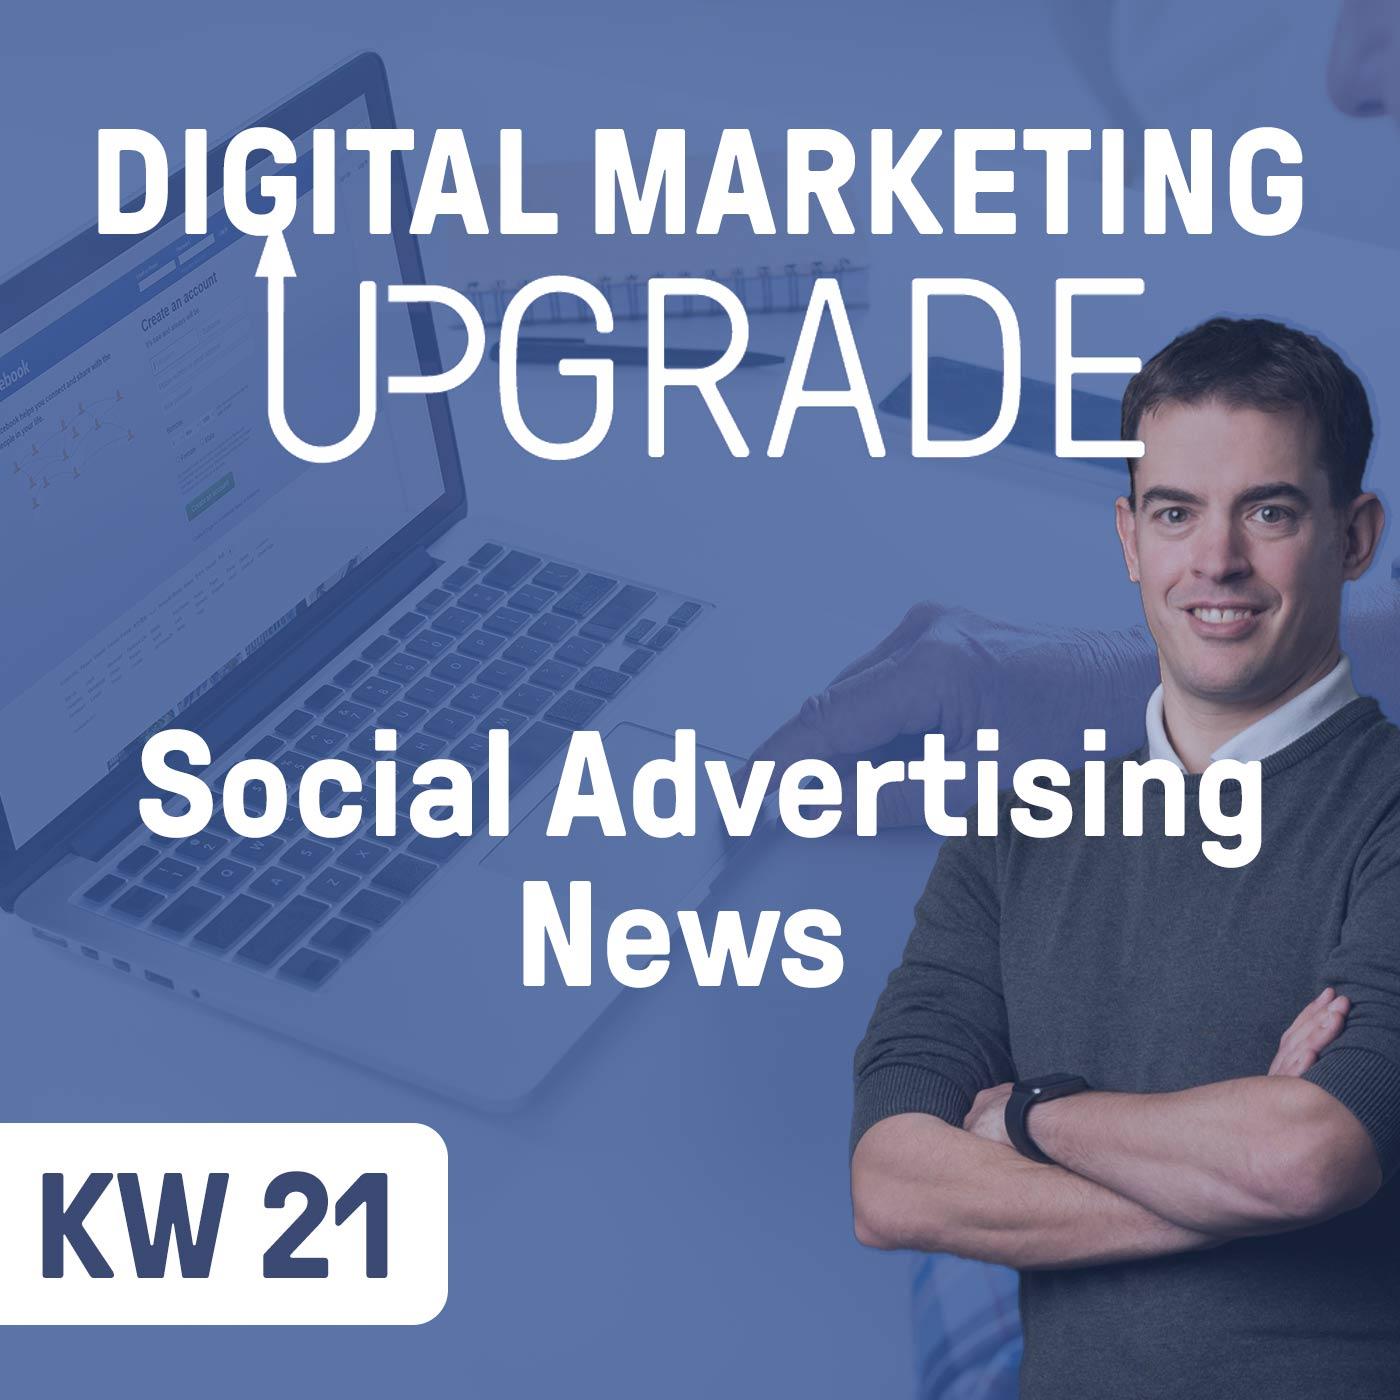 Social Advertising News - KW 21